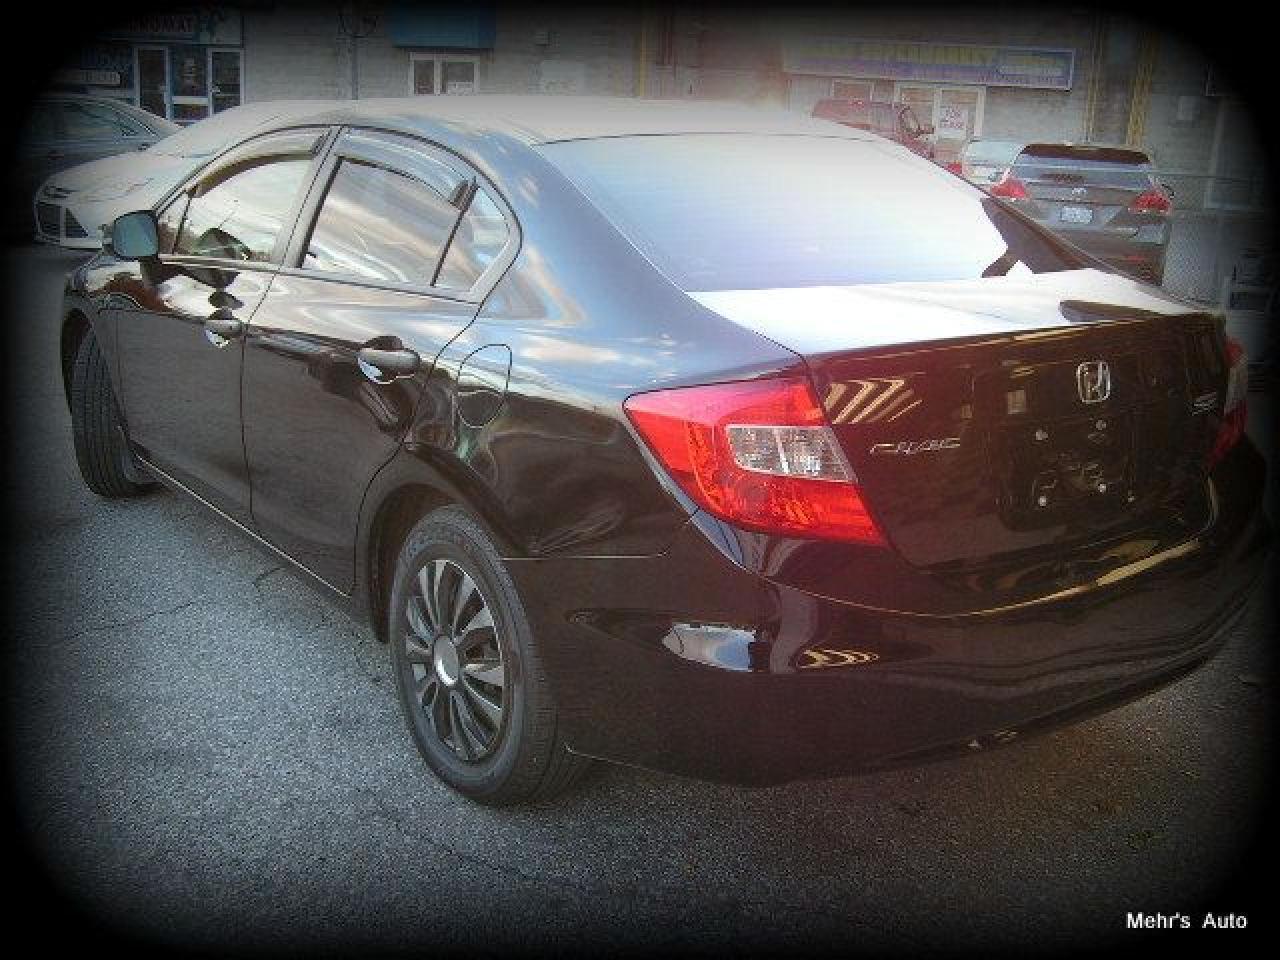 2012 Honda Civic DX 4Dr Manual No Accident Ont Car